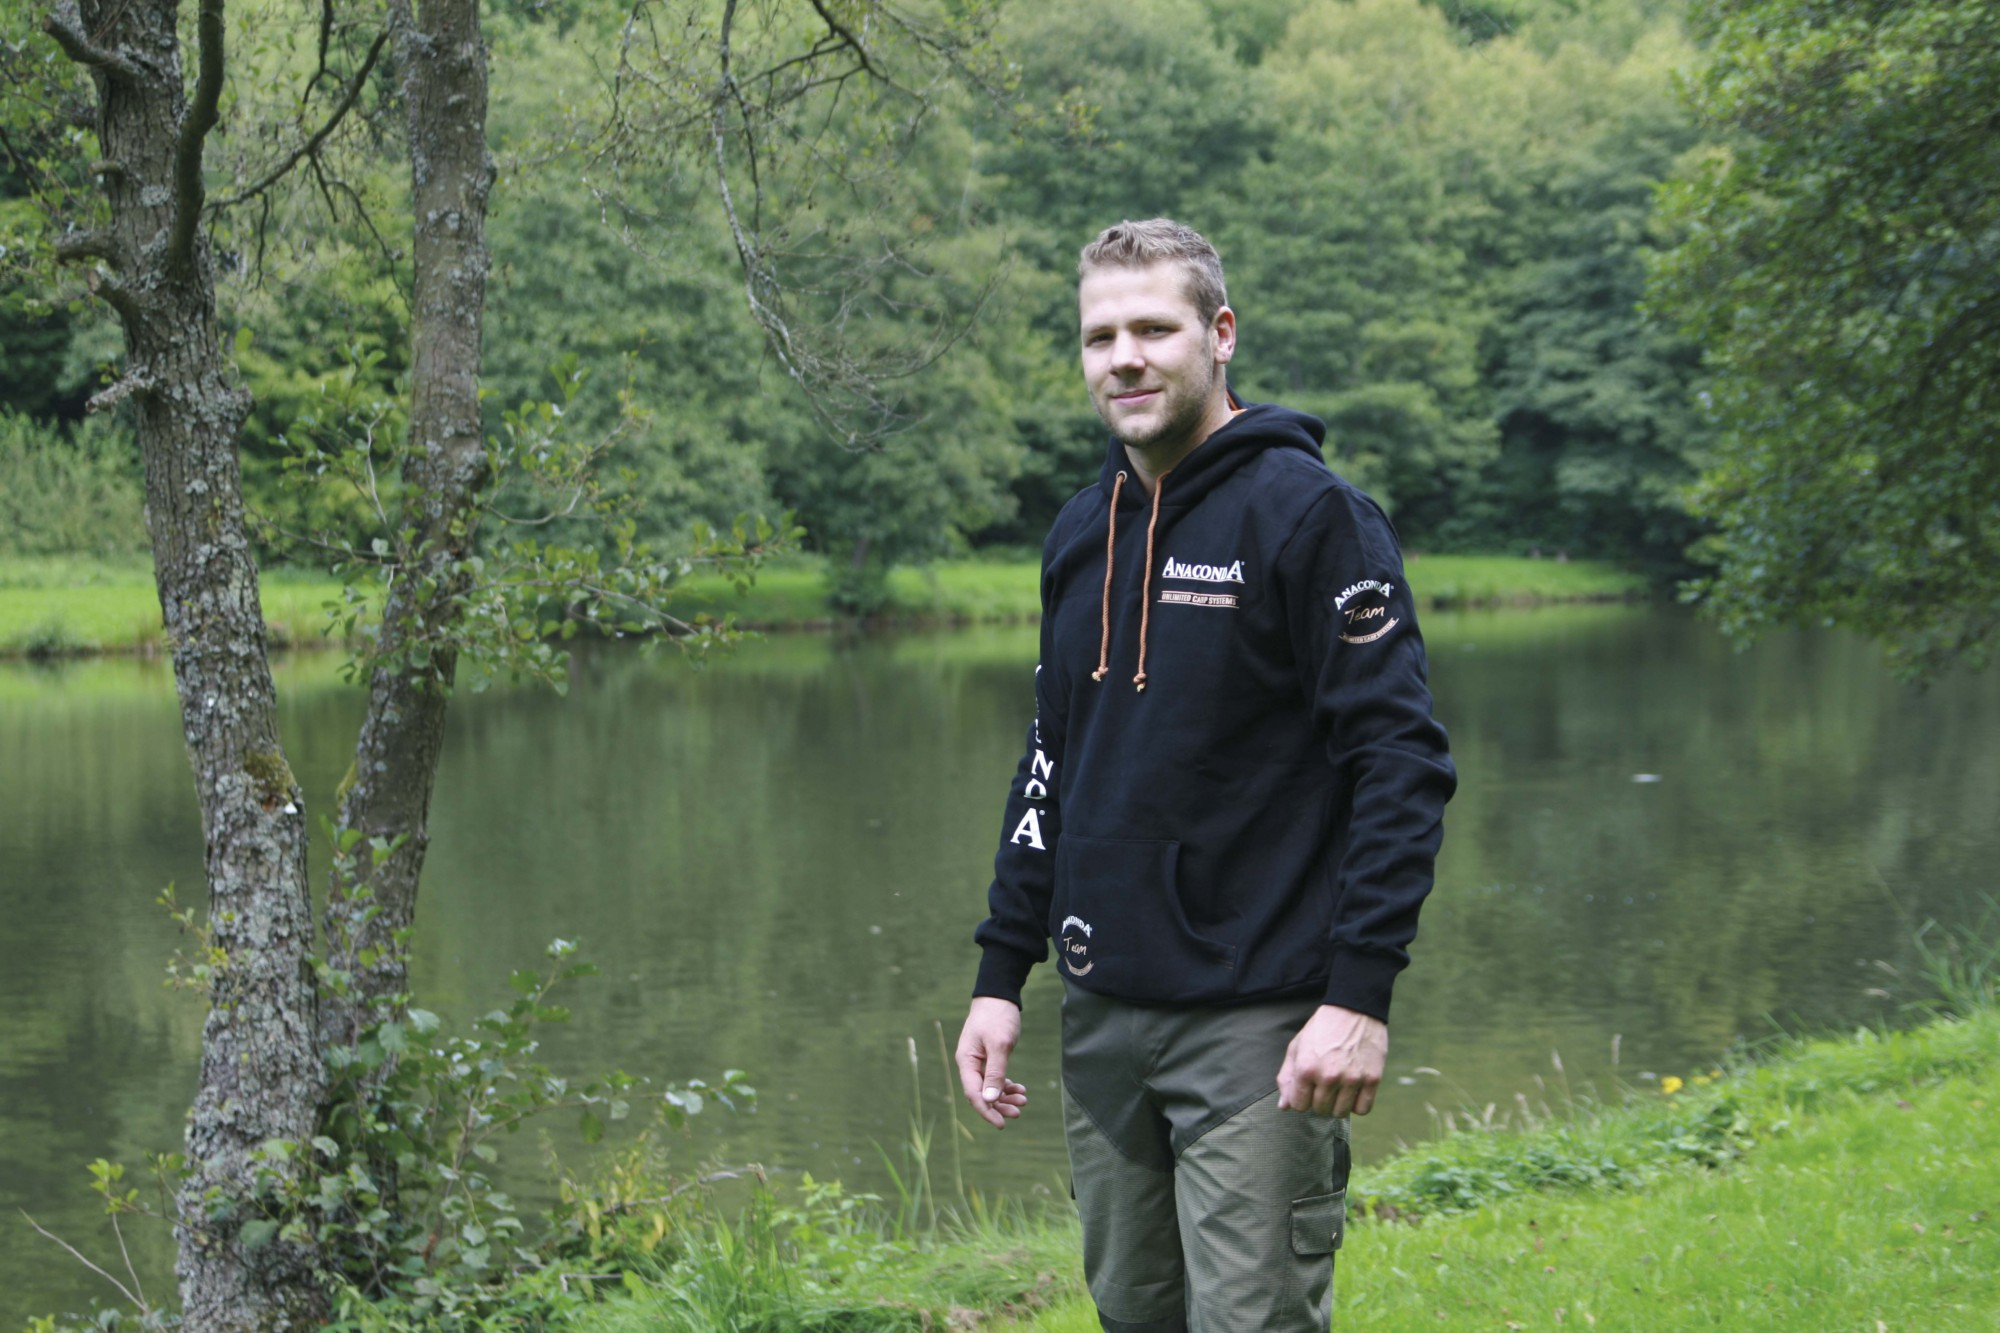 anaconda-hoody-gr-xxxl-kaputzen-pullover, 56.95 EUR @ raubfischjagd-de